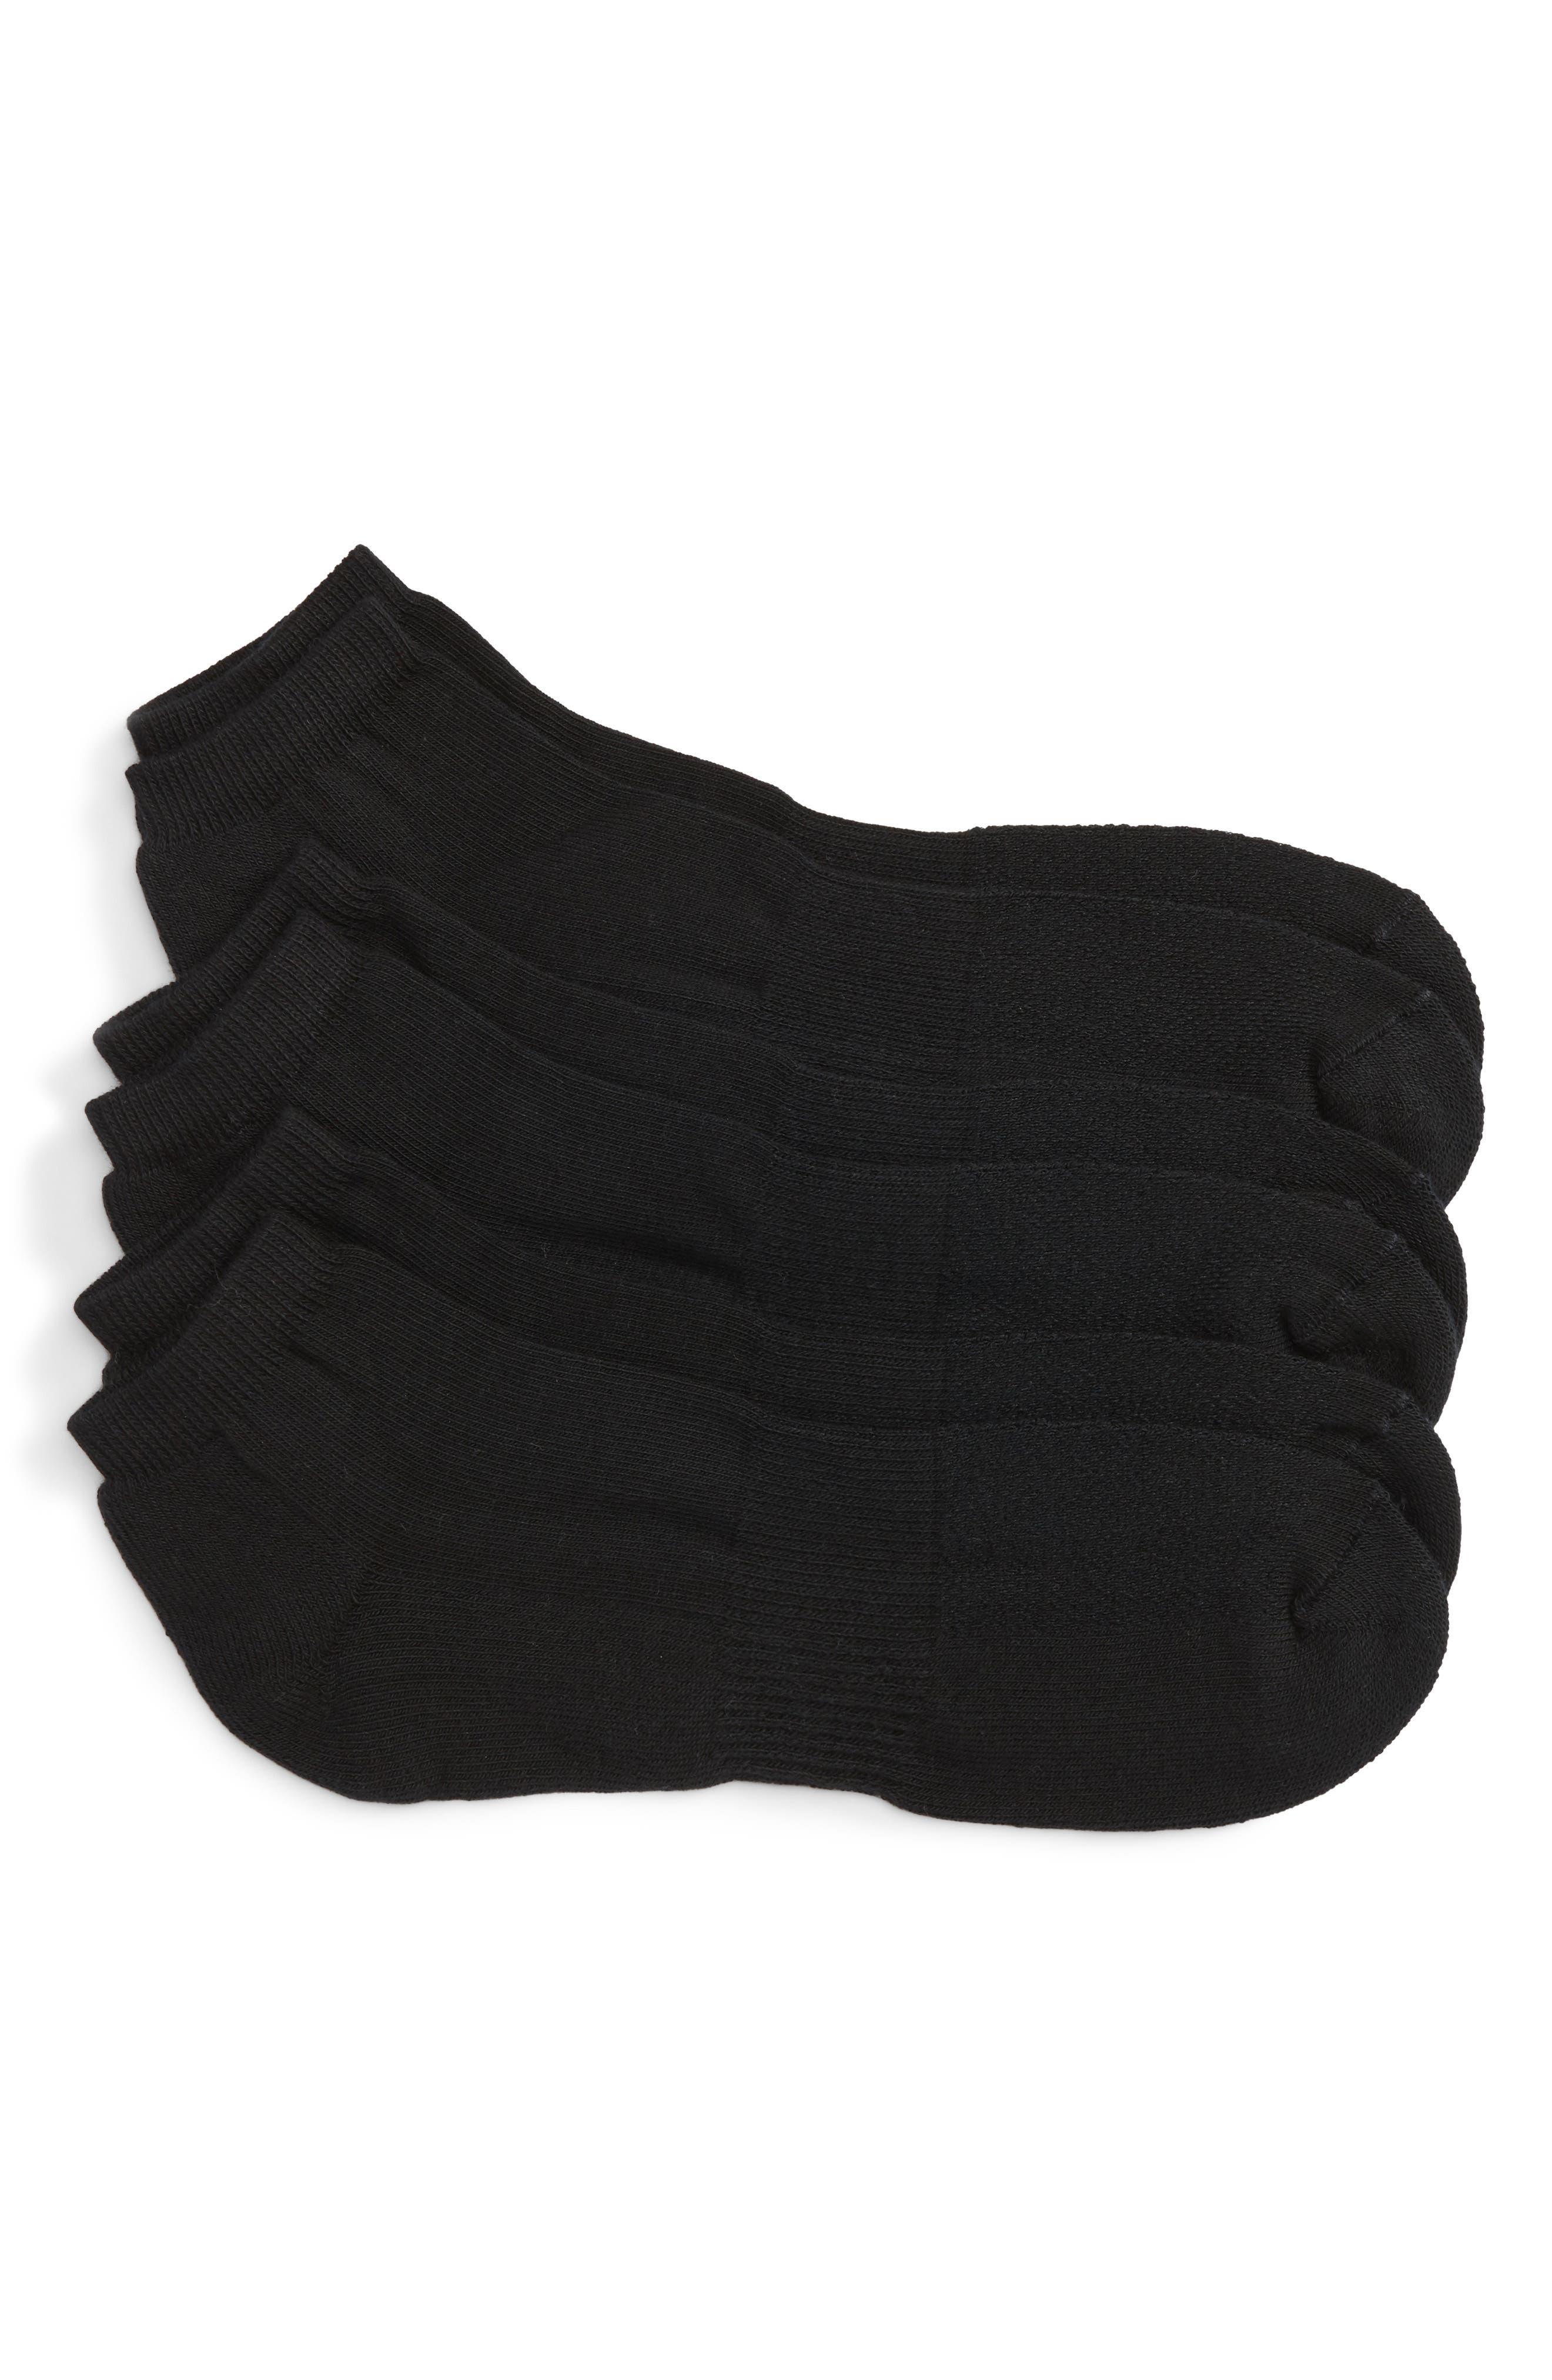 NORDSTROM MEN'S SHOP, 3-Pack No-Show Athletic Socks, Main thumbnail 1, color, BLACK